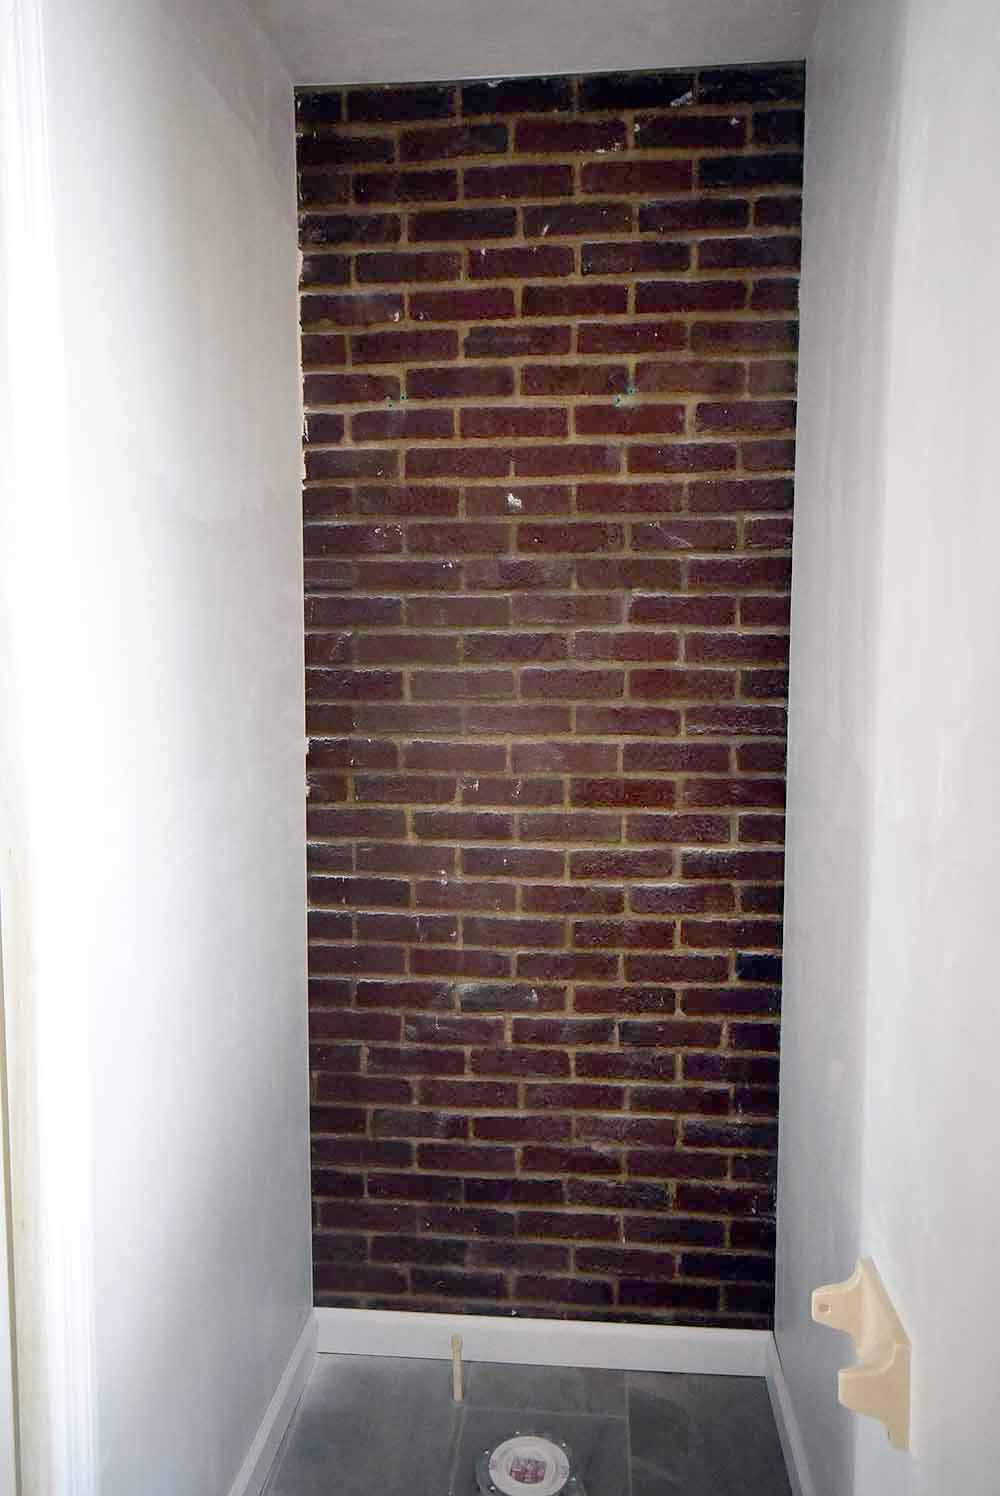 brickwallbath.jpg